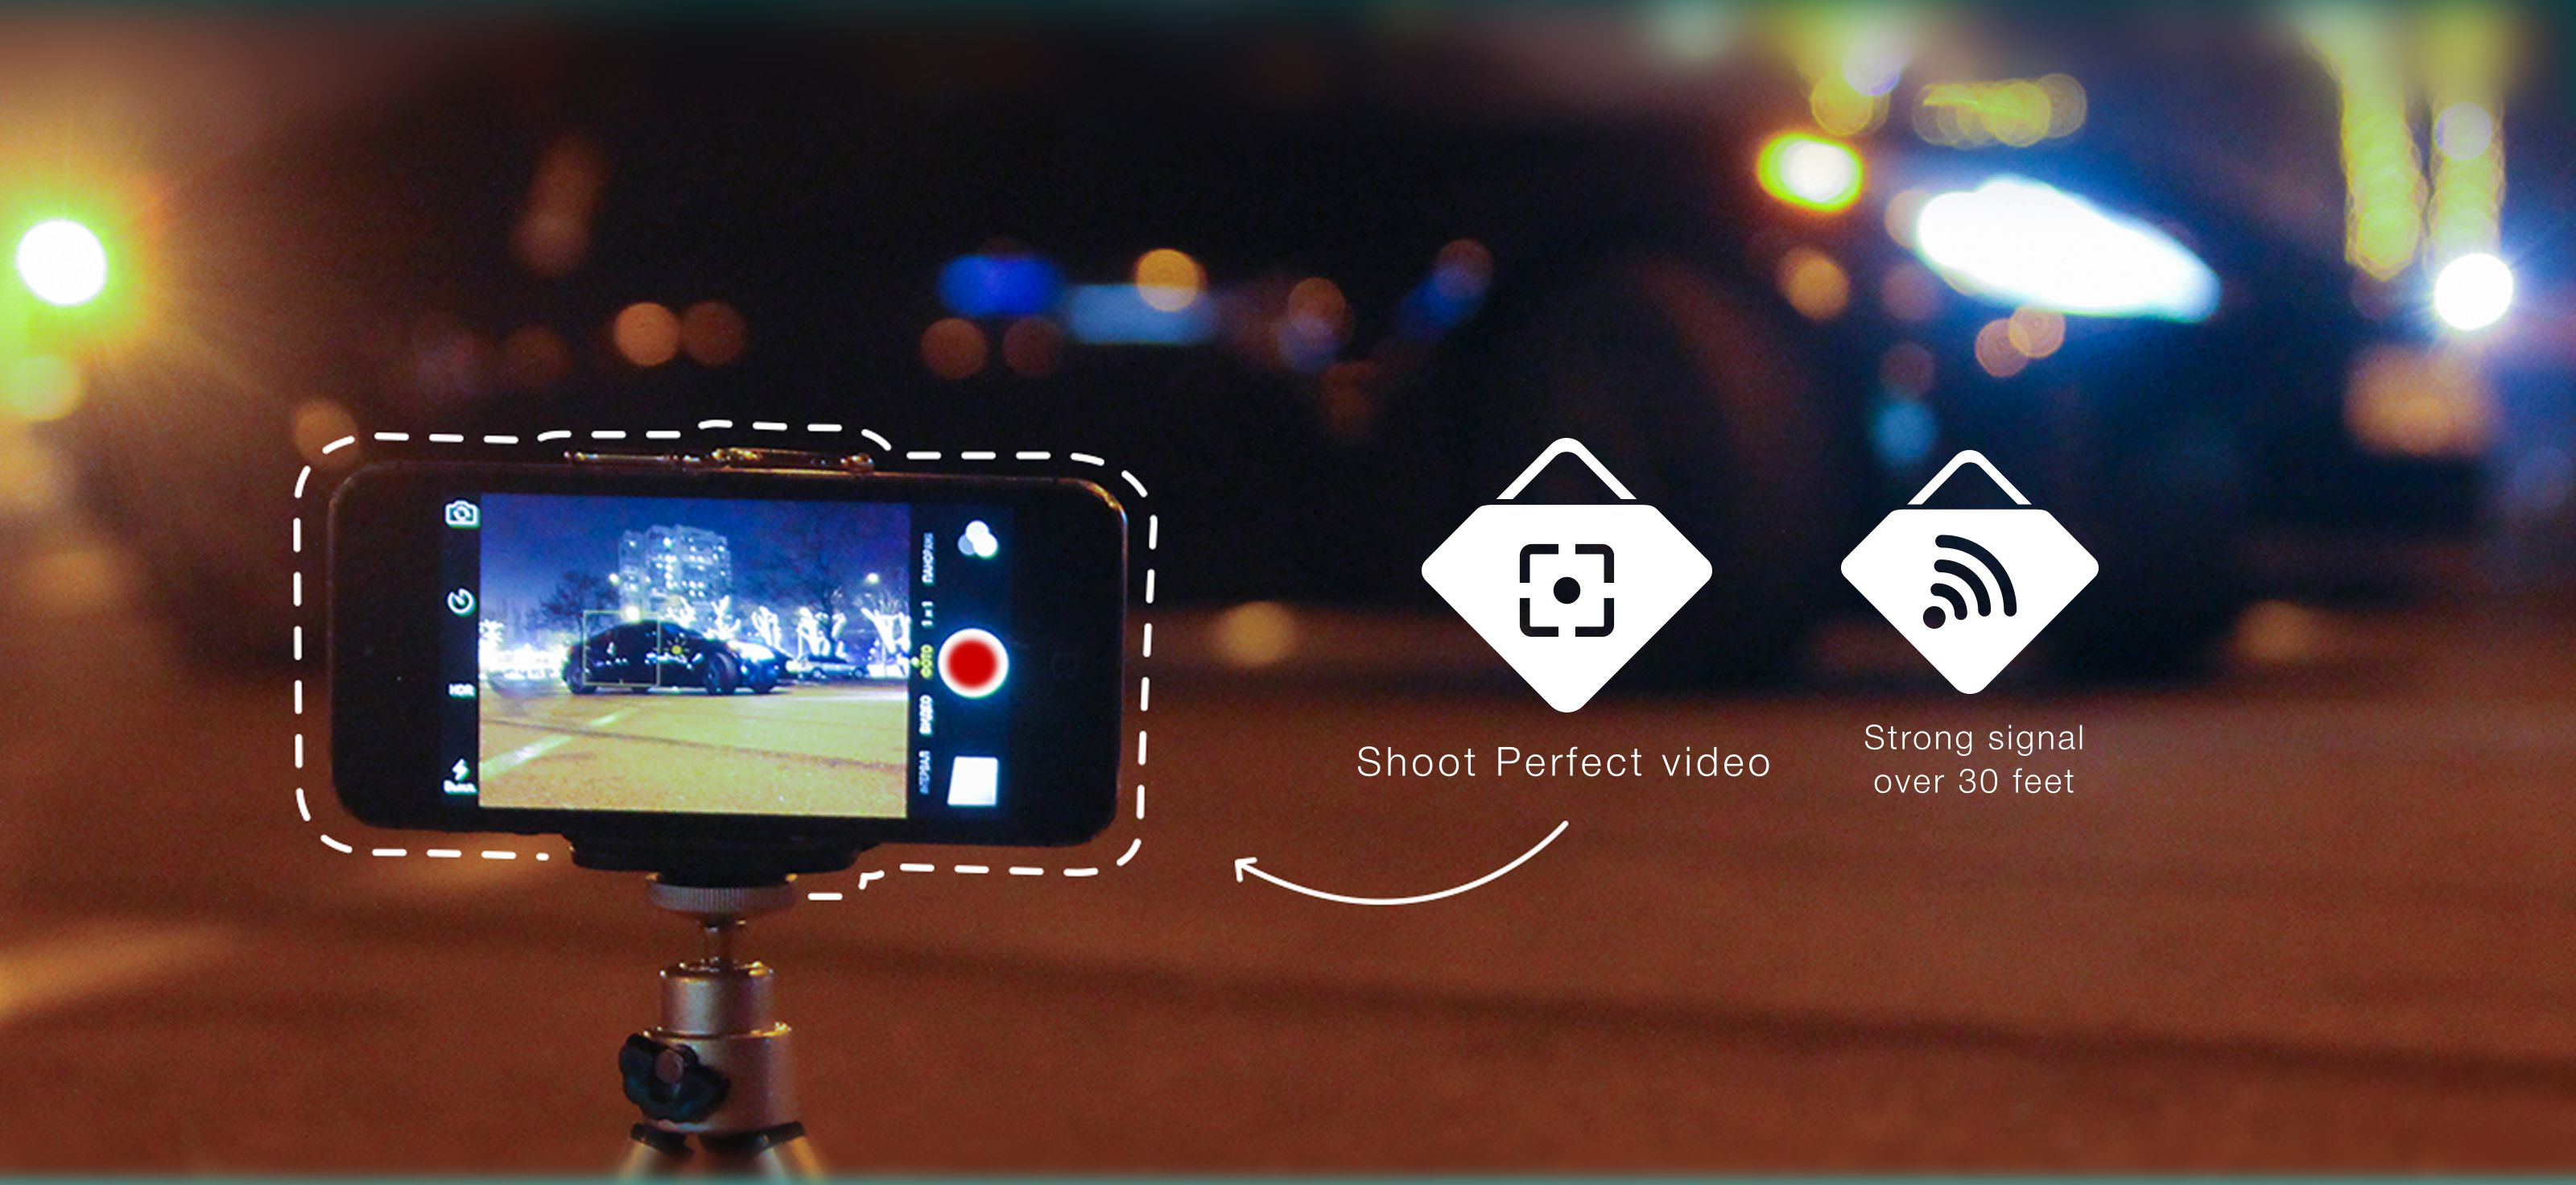 Pin by EmoFix on EmoFix | Capture photo, Professional Camera